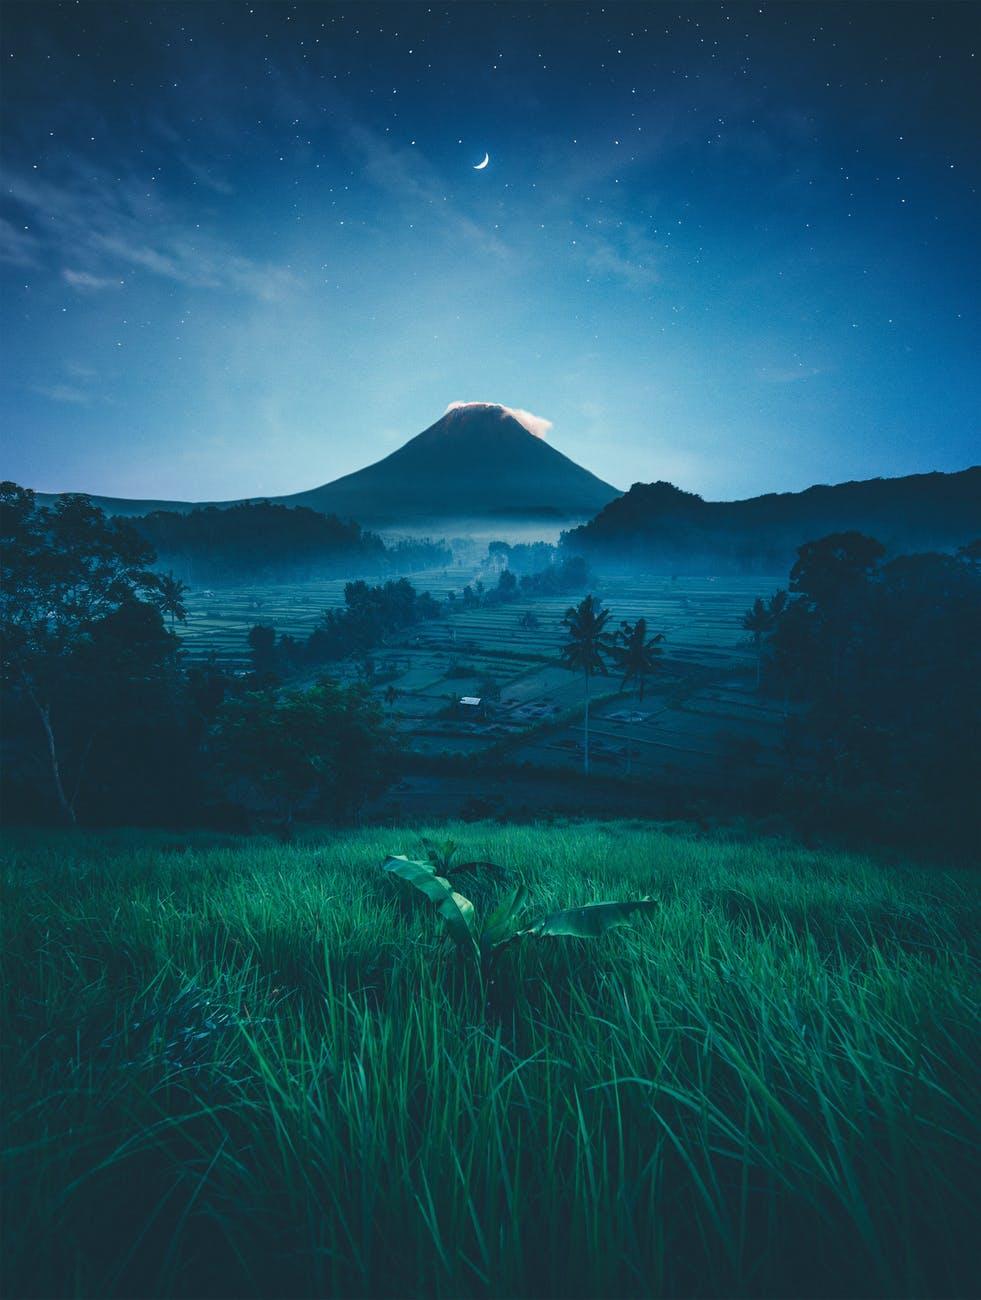 cropland duiring night time